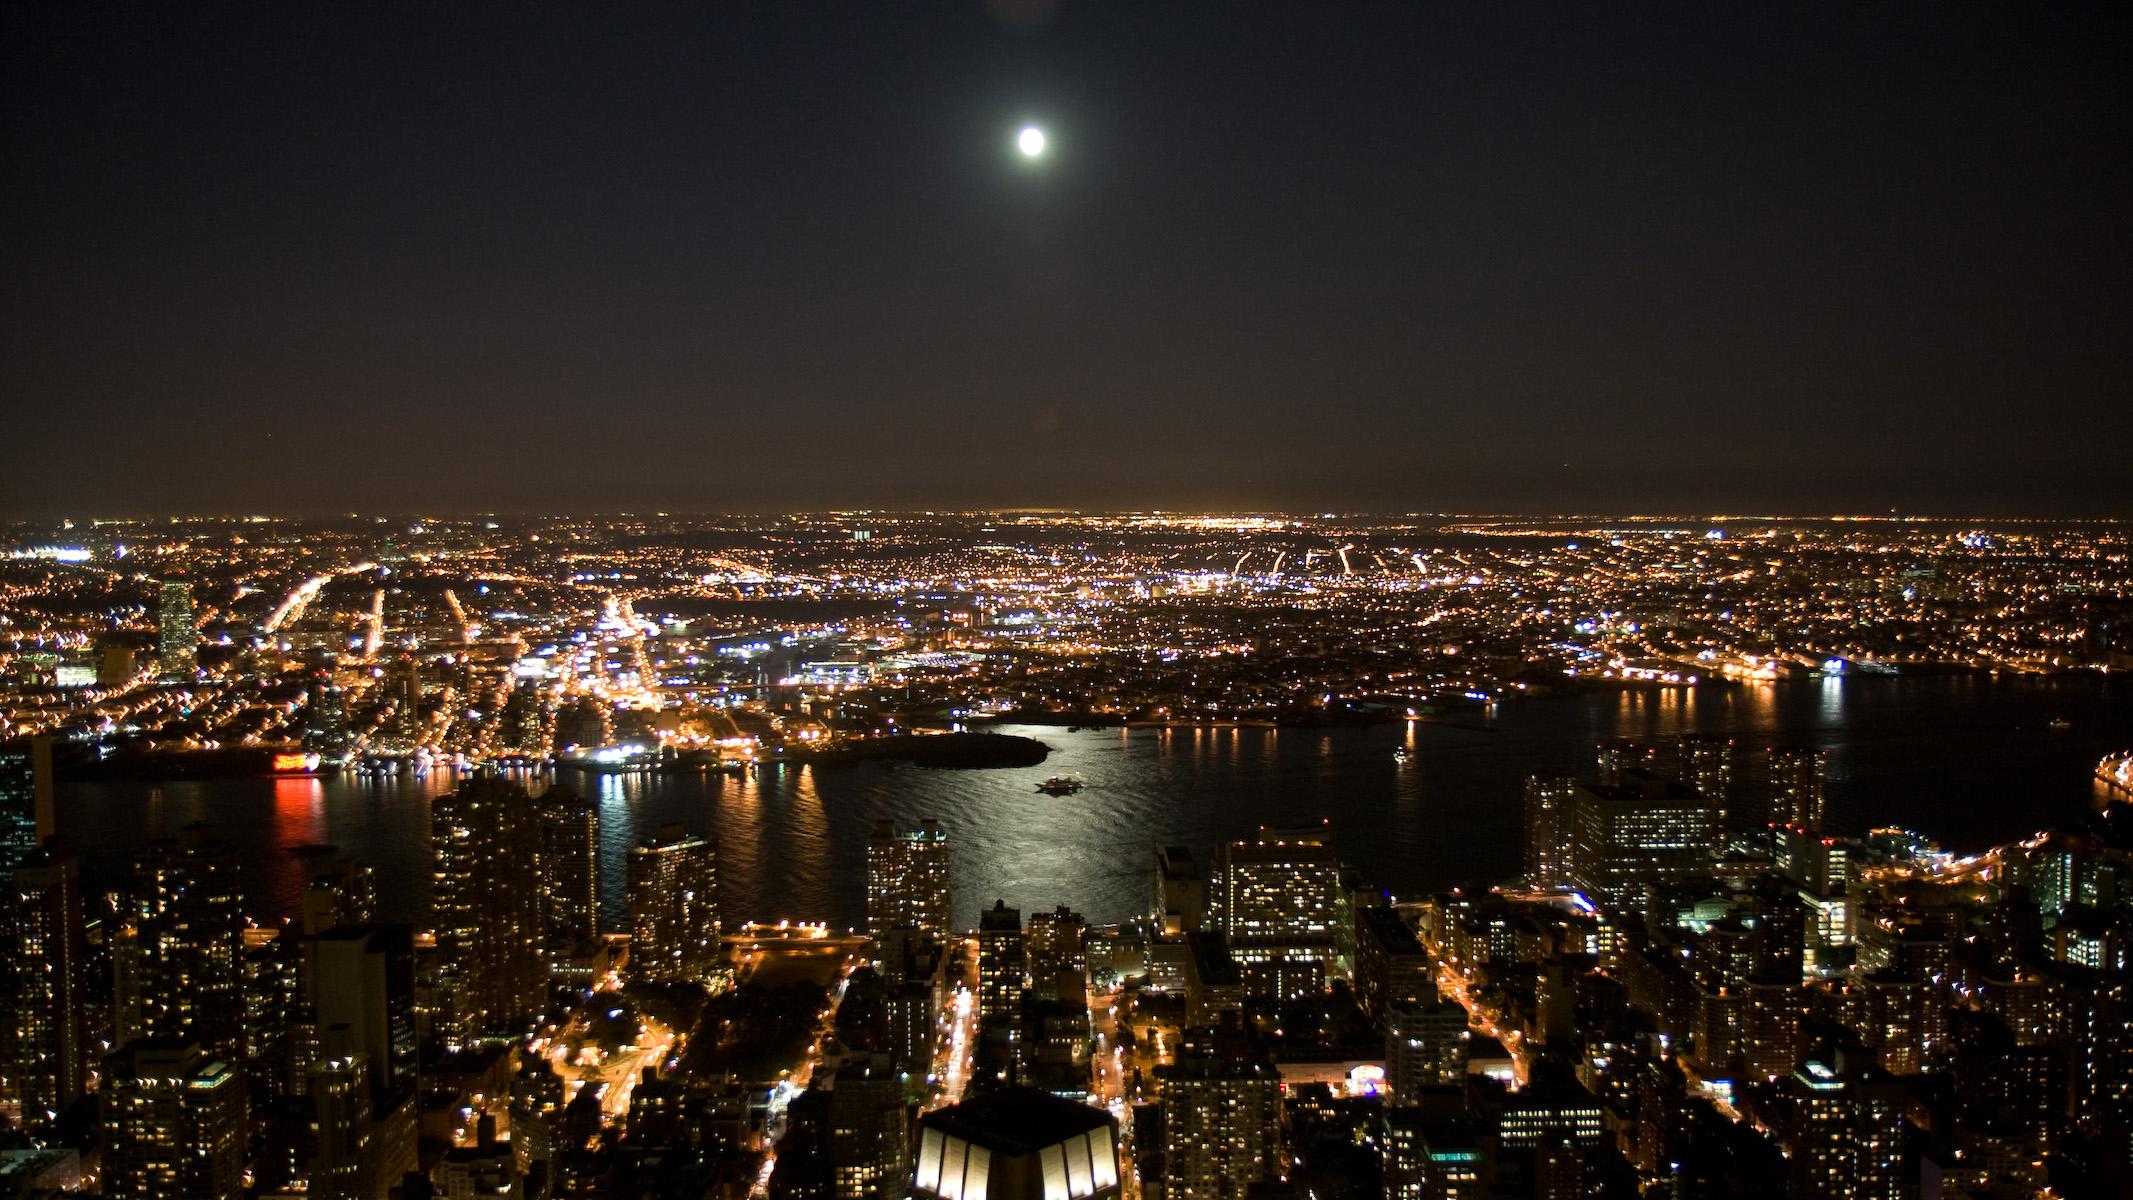 New_York_City_Night_by_parka.jpg